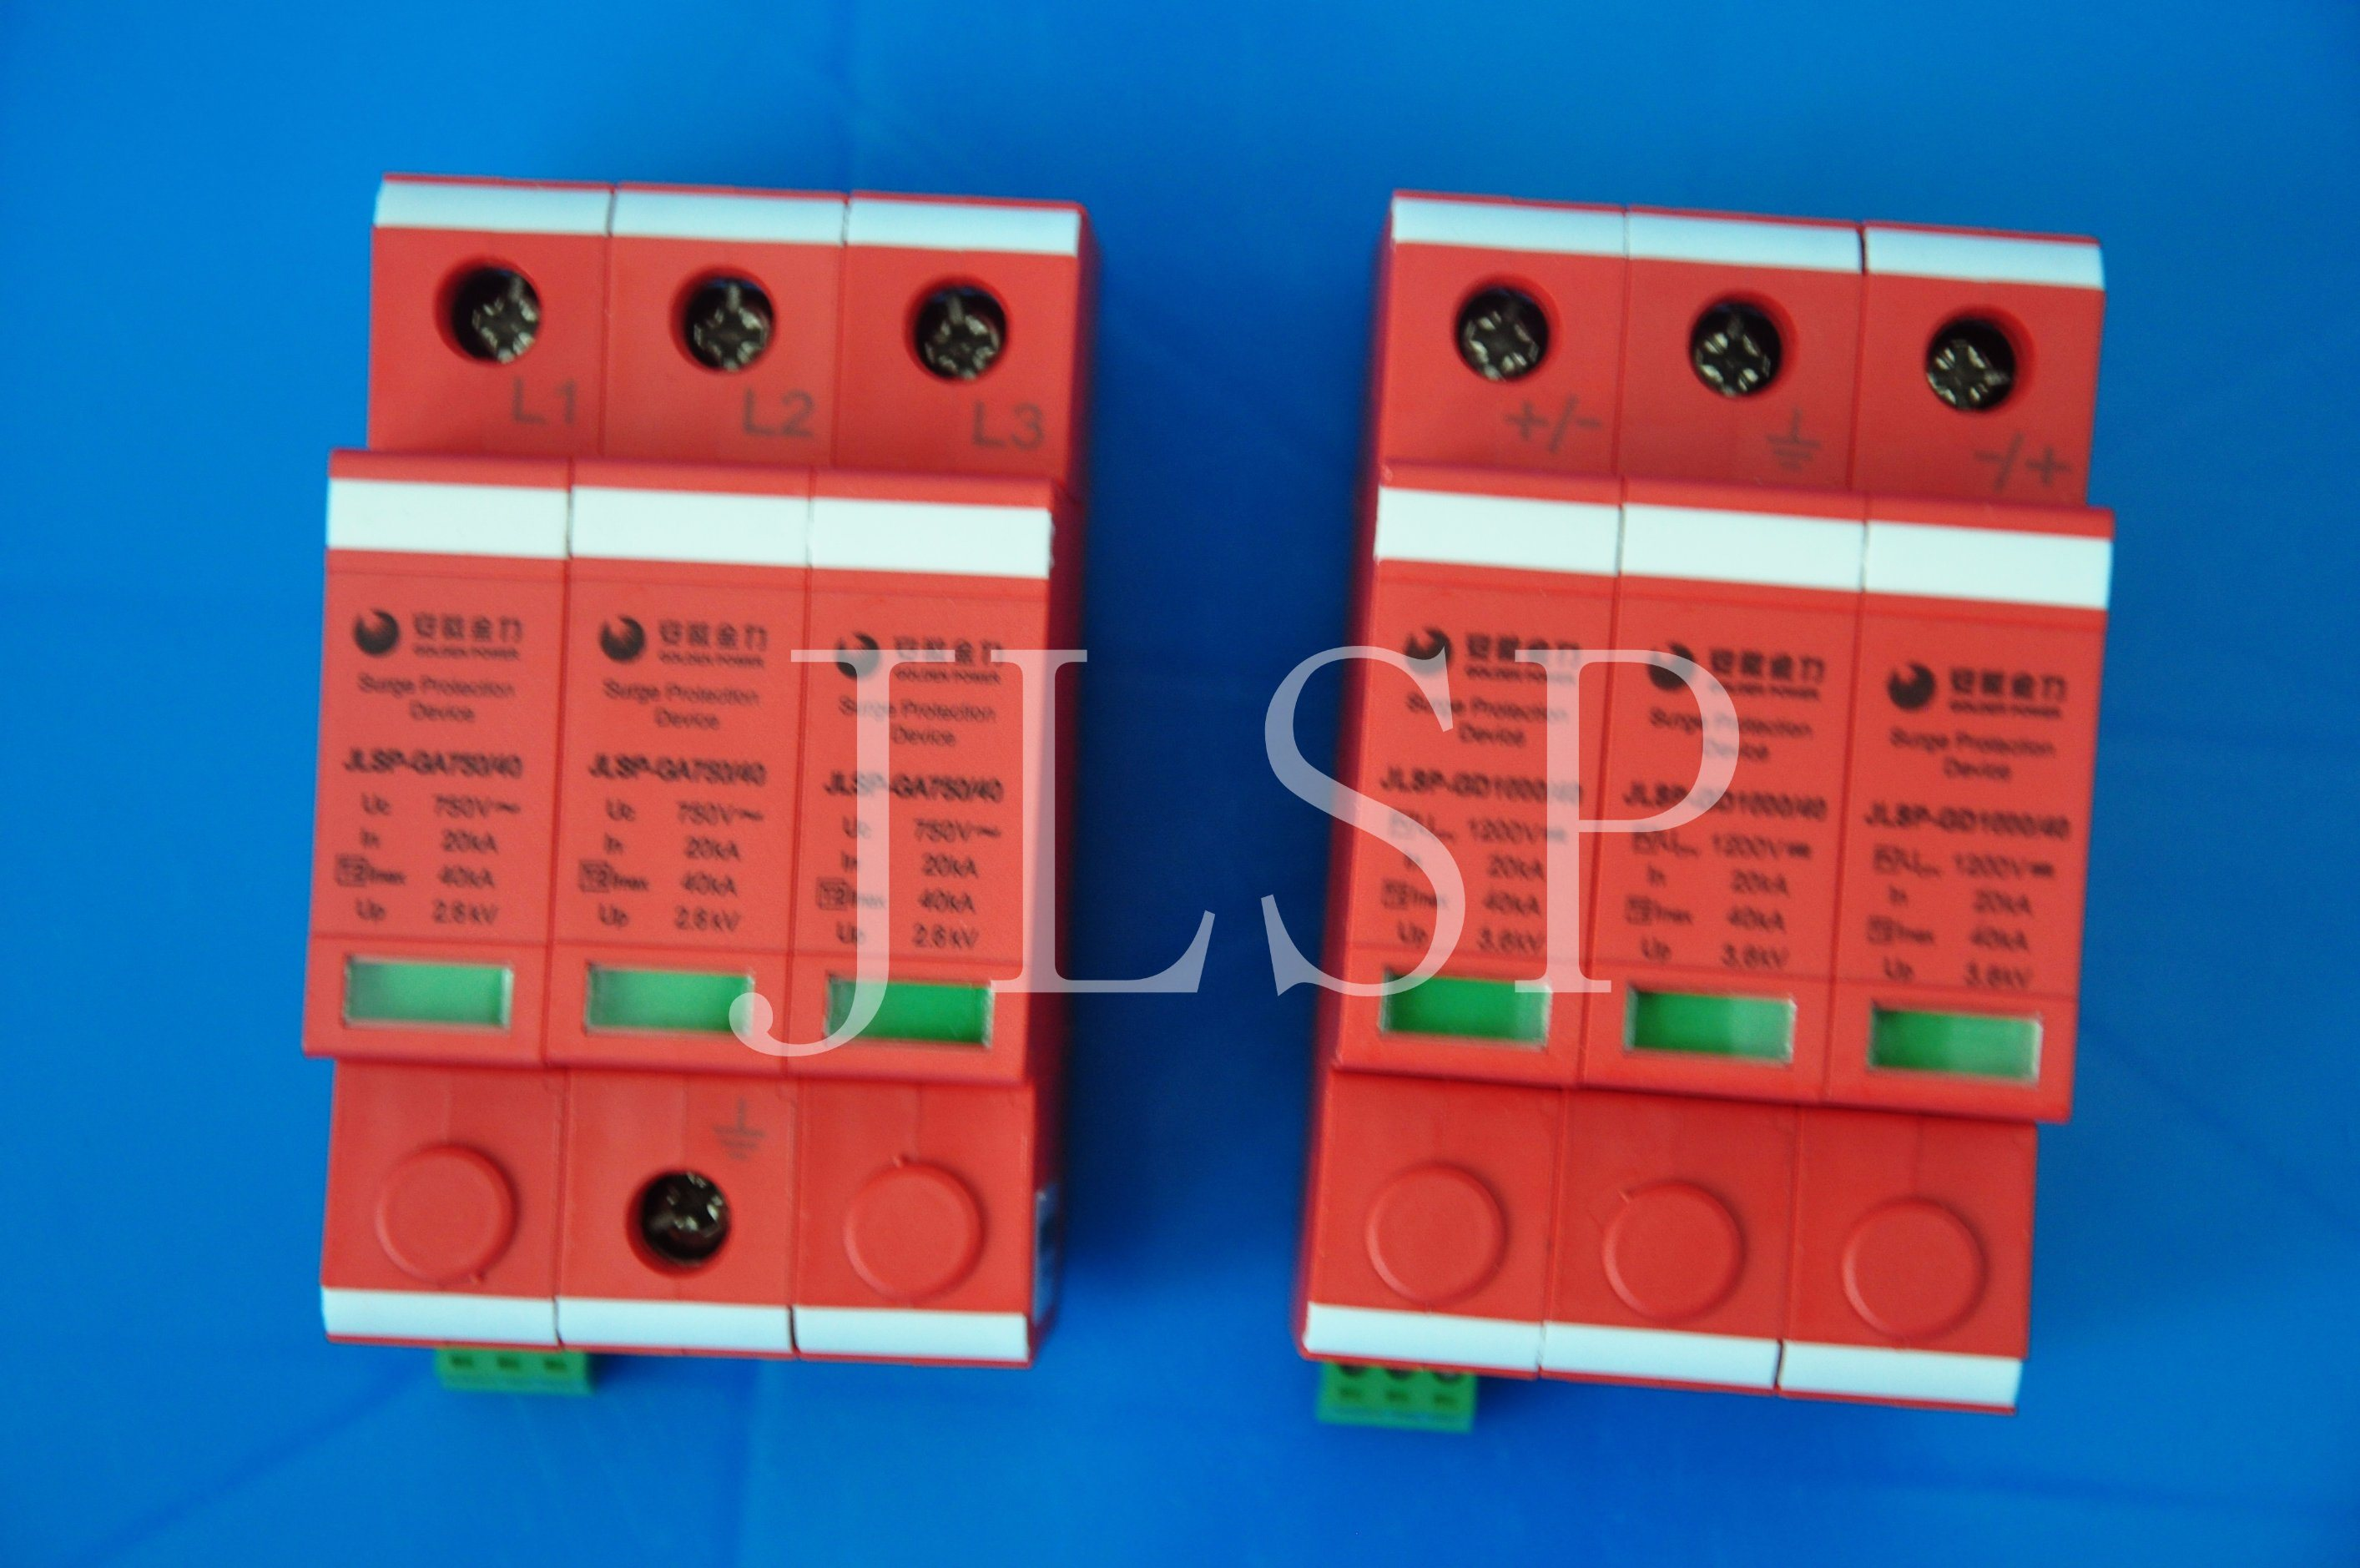 PV Application 20-40ka Solar 3p DC 1000V, Jlsp-Gd1000-40, SPD, Surge Protector, 17006